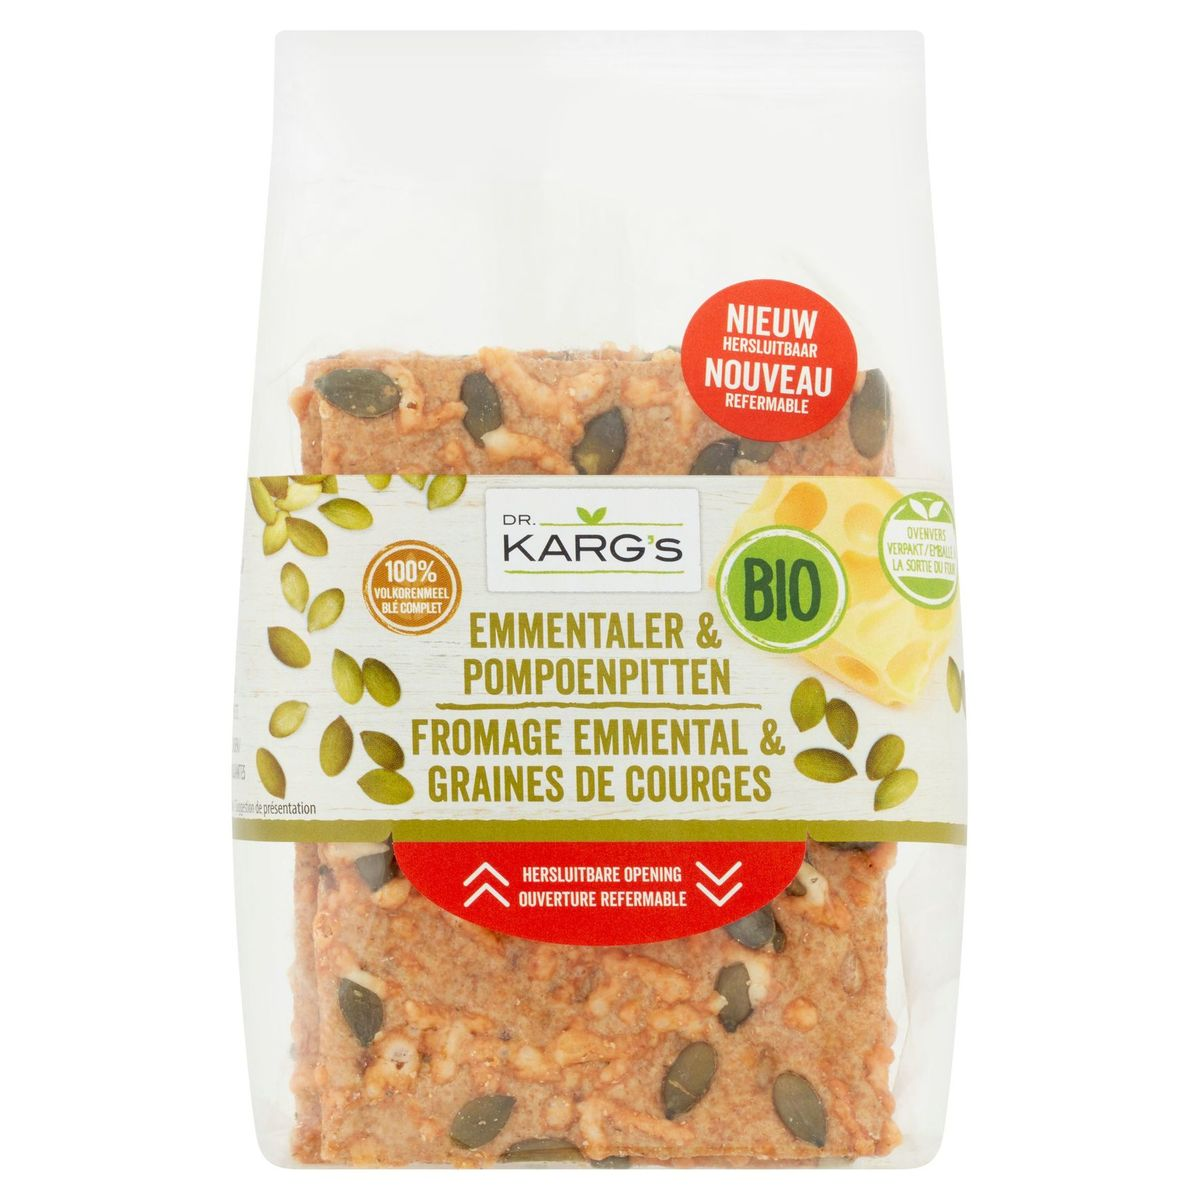 Dr. Karg's Bio Fromage Emmental & Graines de Courges 200 g